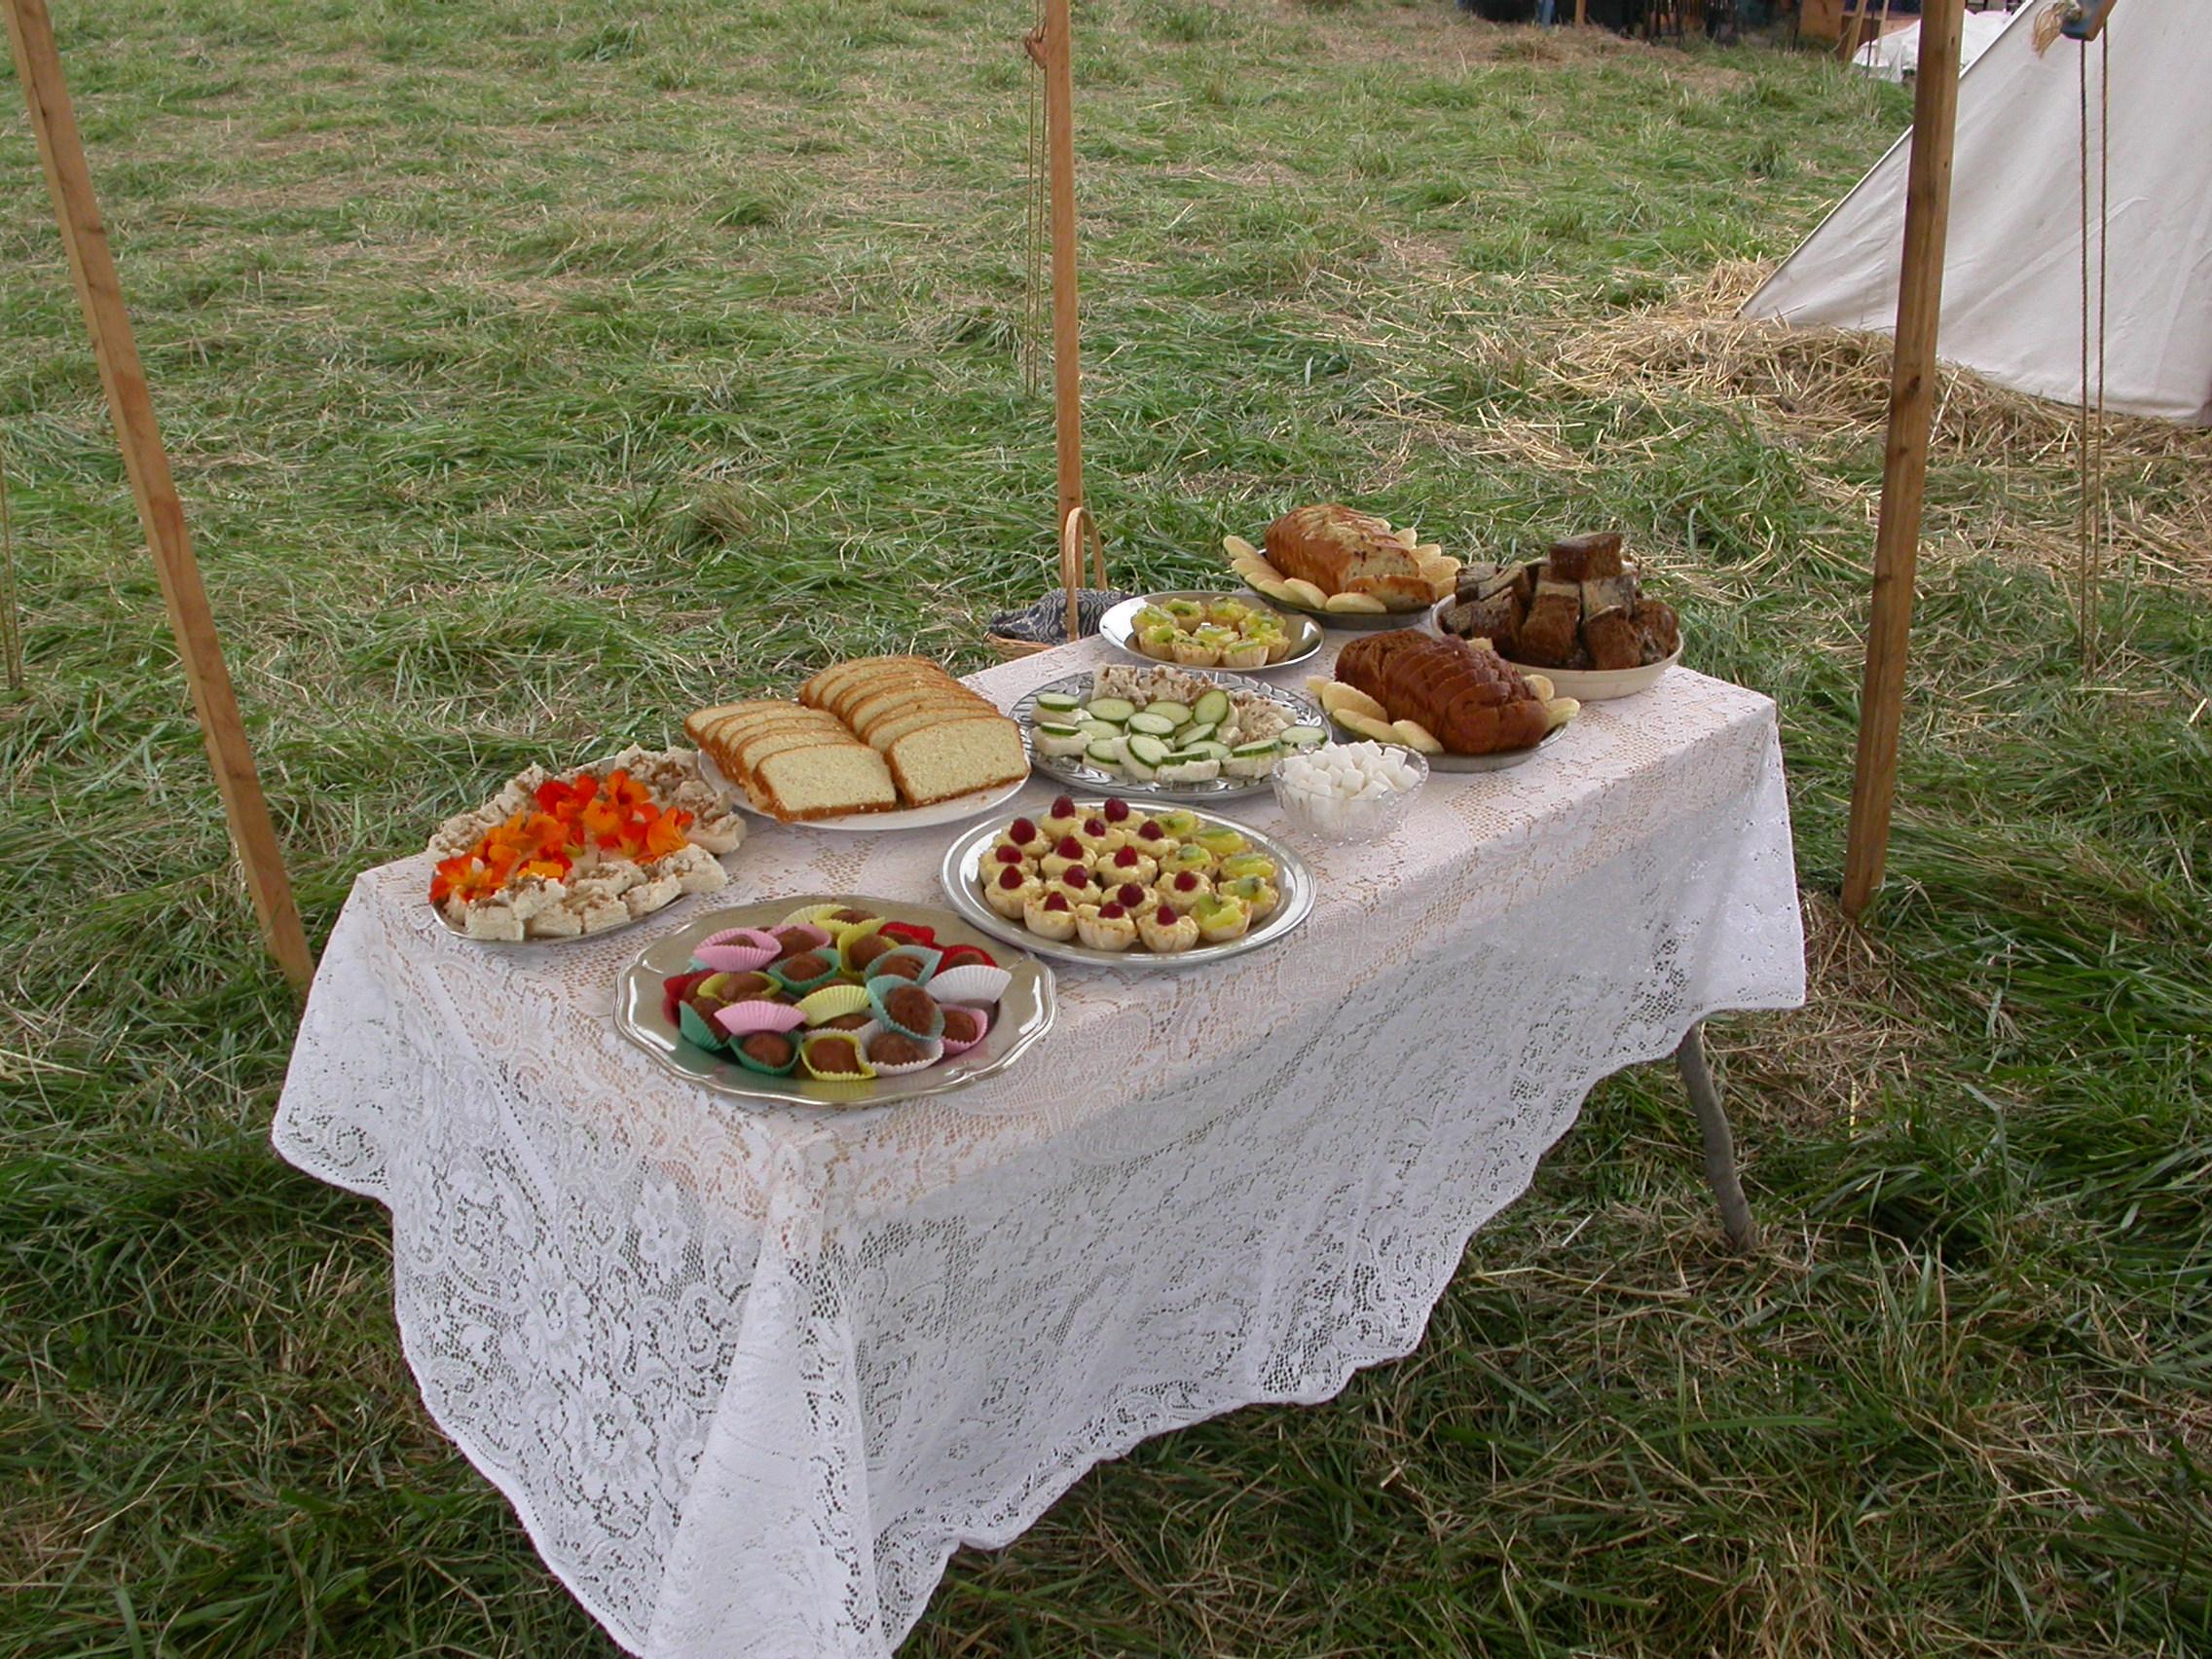 Our ladies prepare a feast